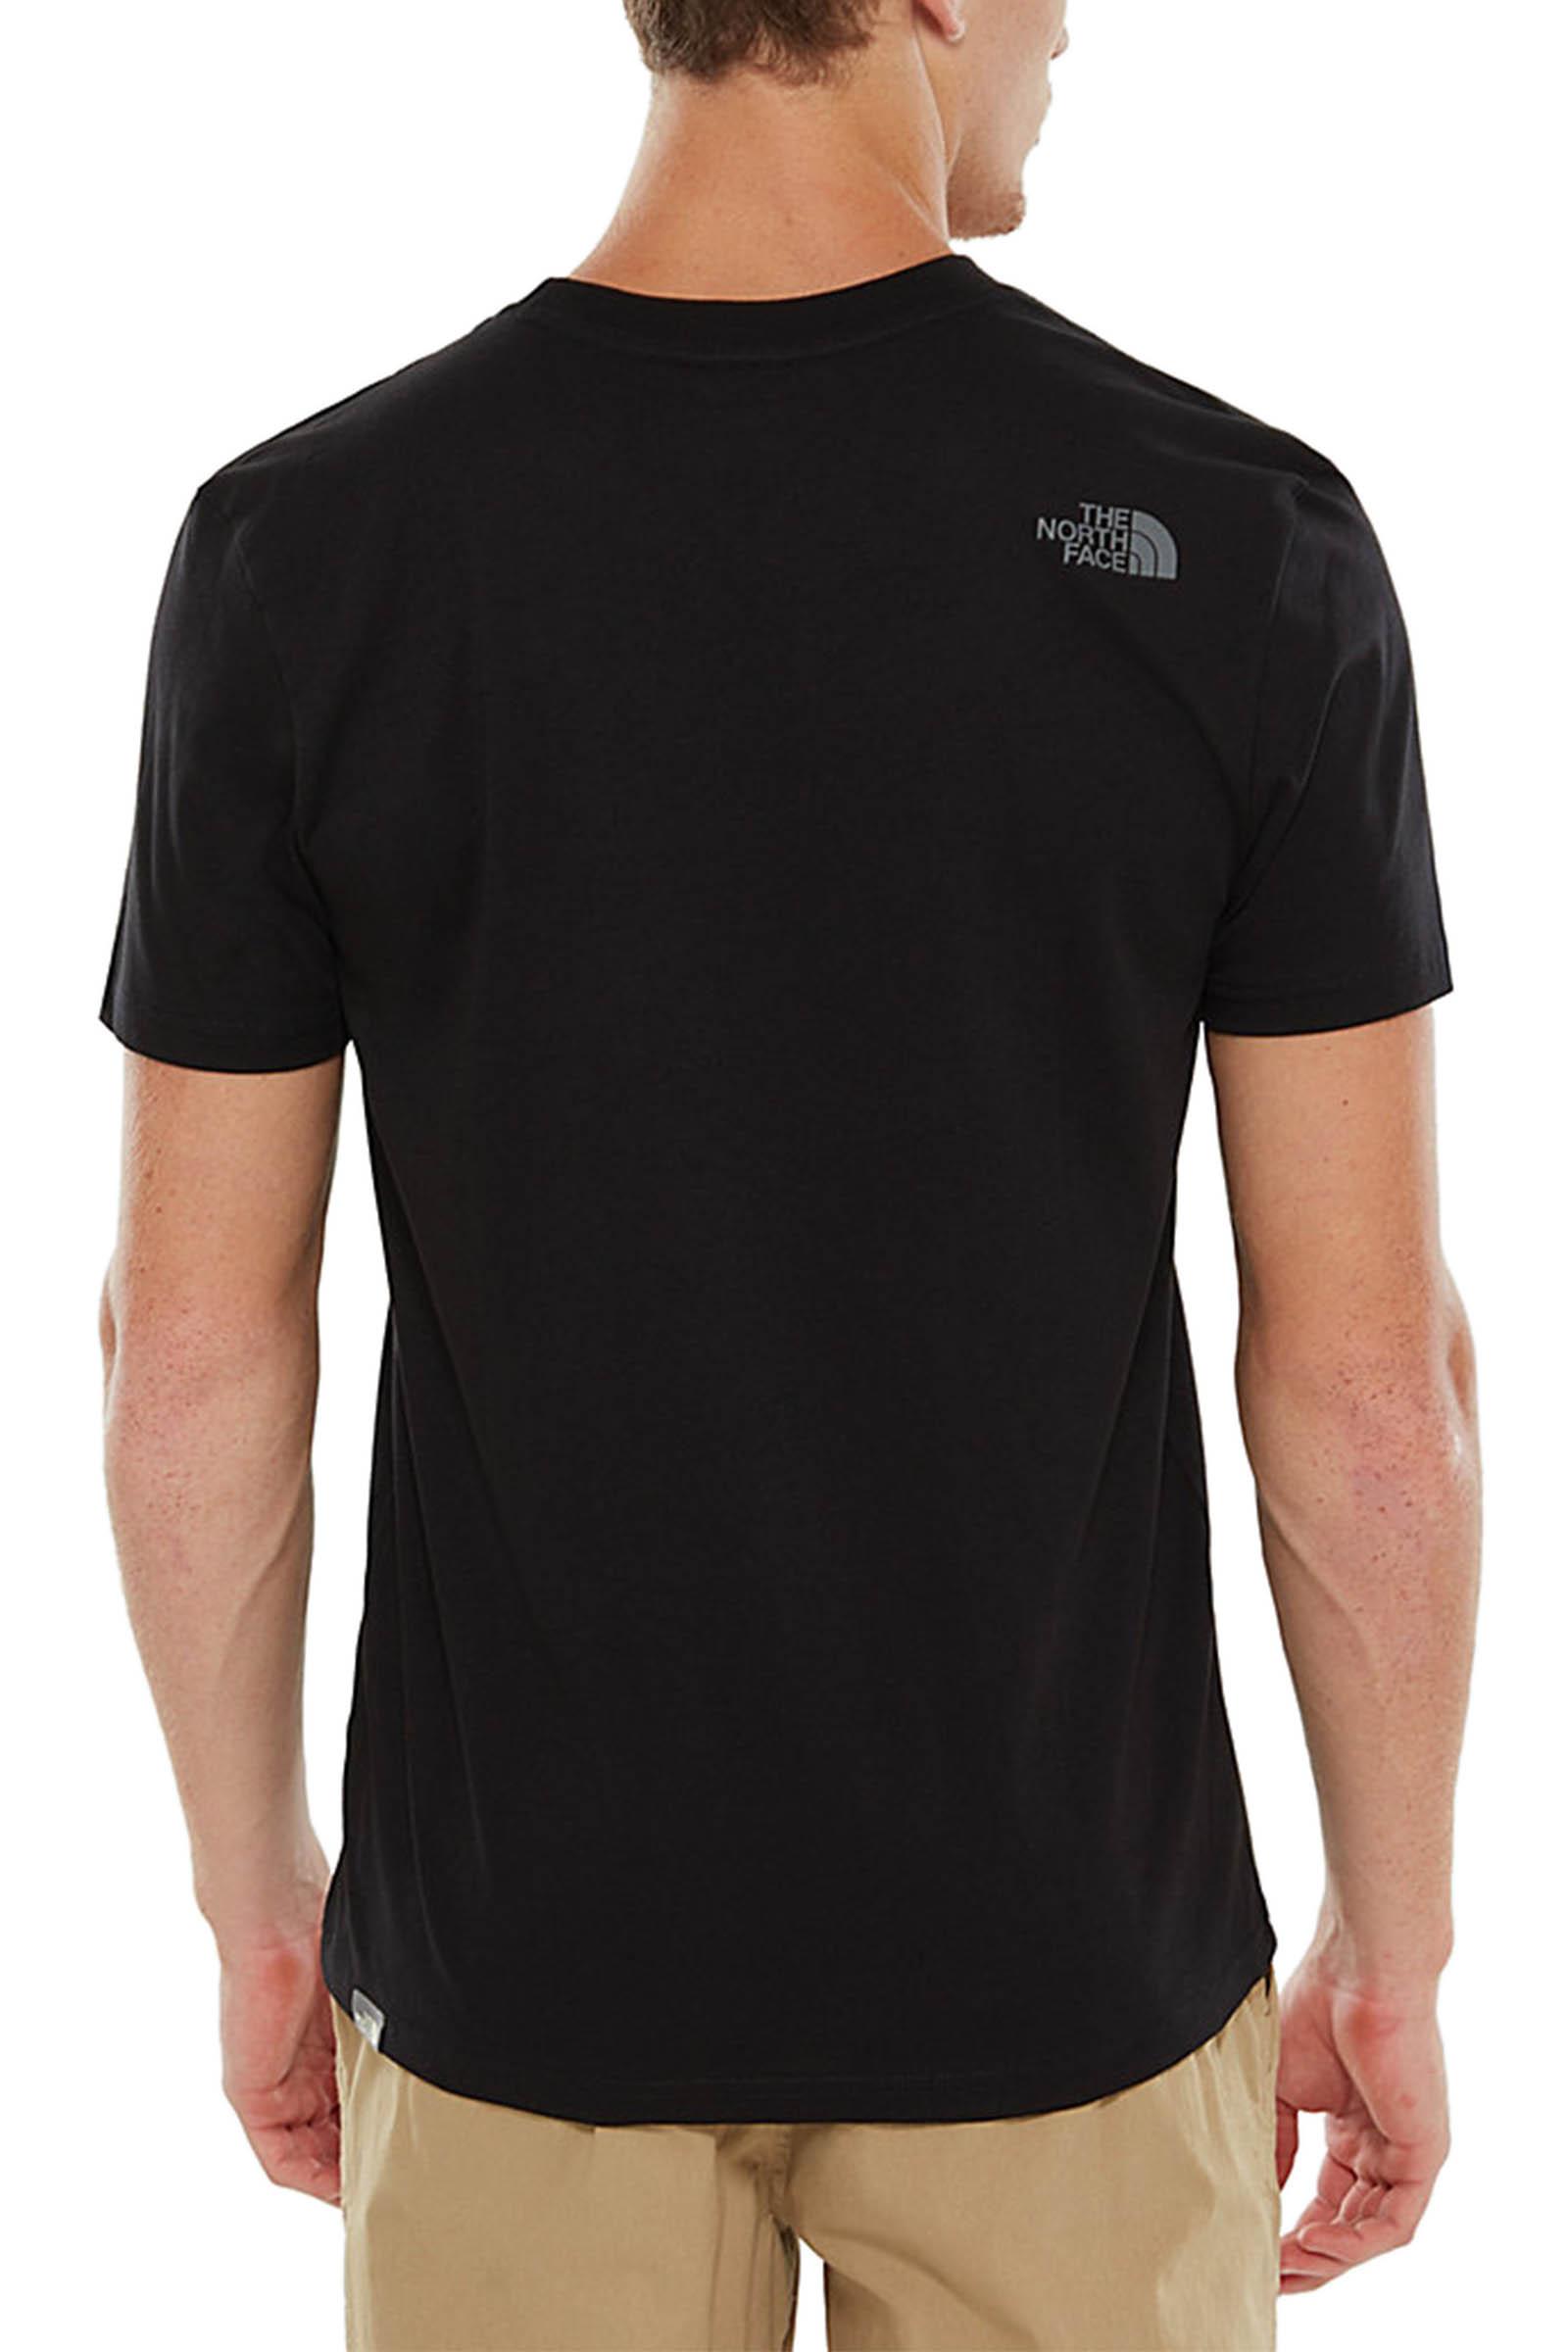 fe79056f0 THE NORTH FACE Man T-Shirt